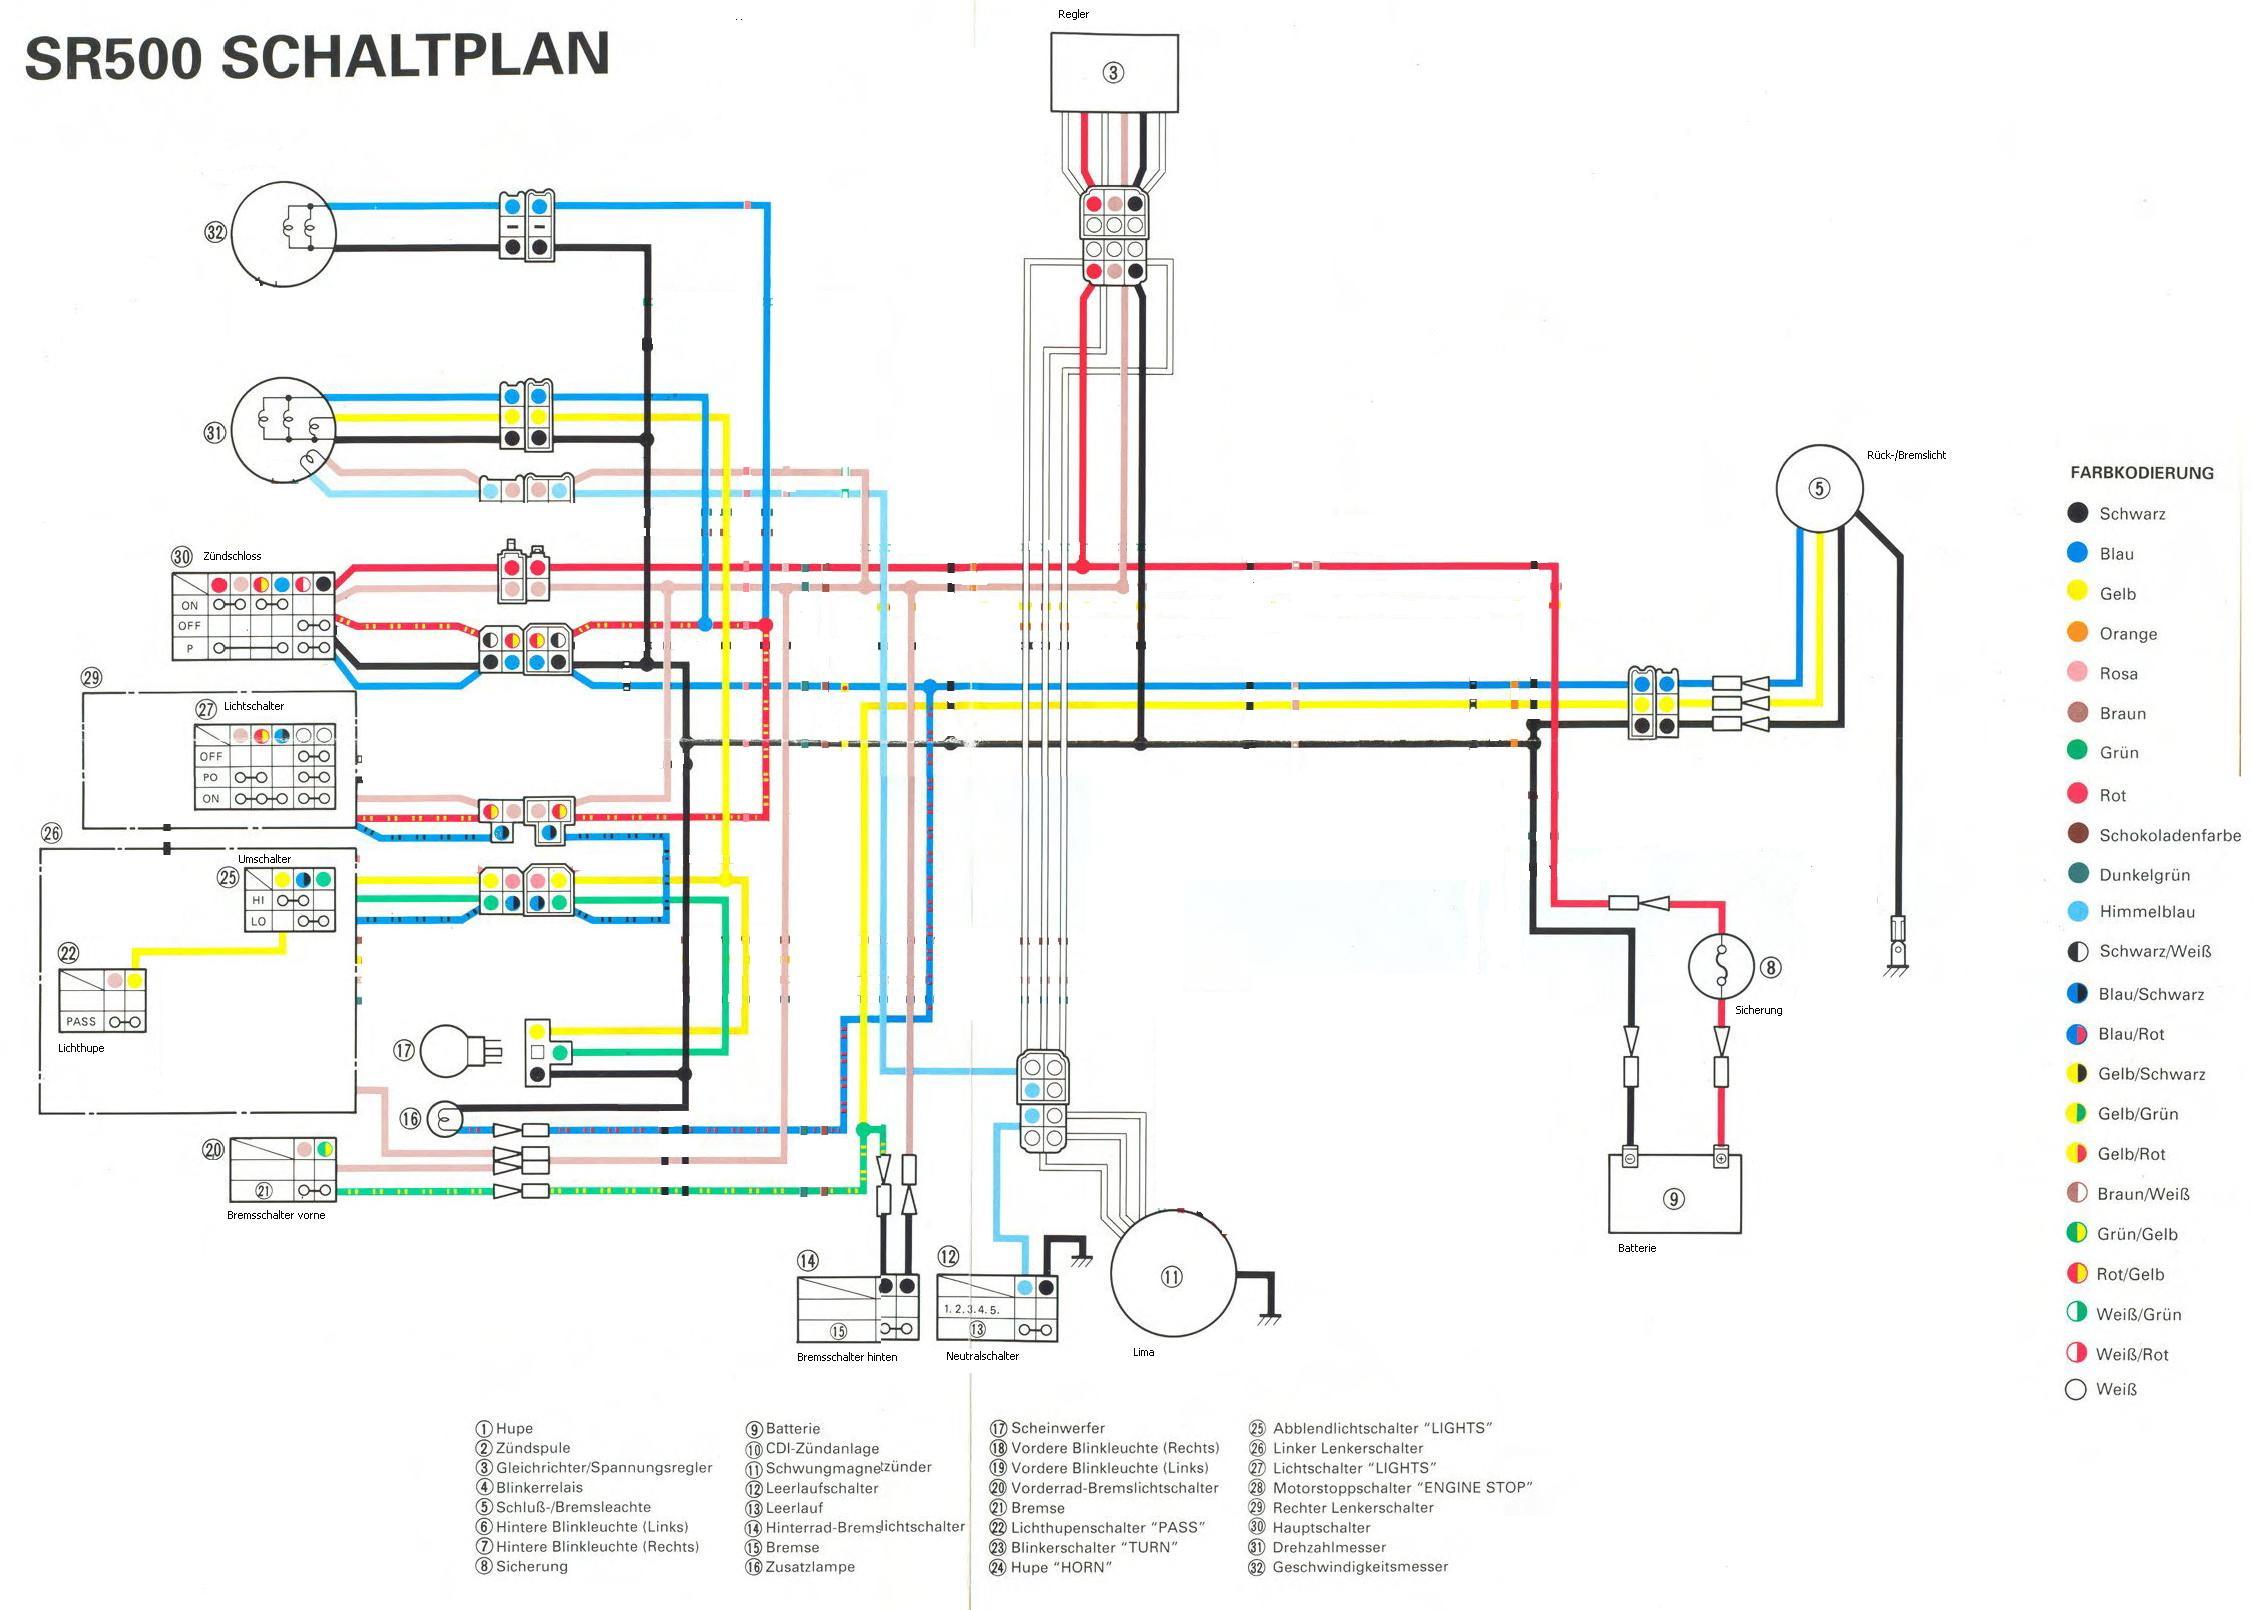 Gemütlich 4 Poliger Relais Schaltplan Ideen - Der Schaltplan ...